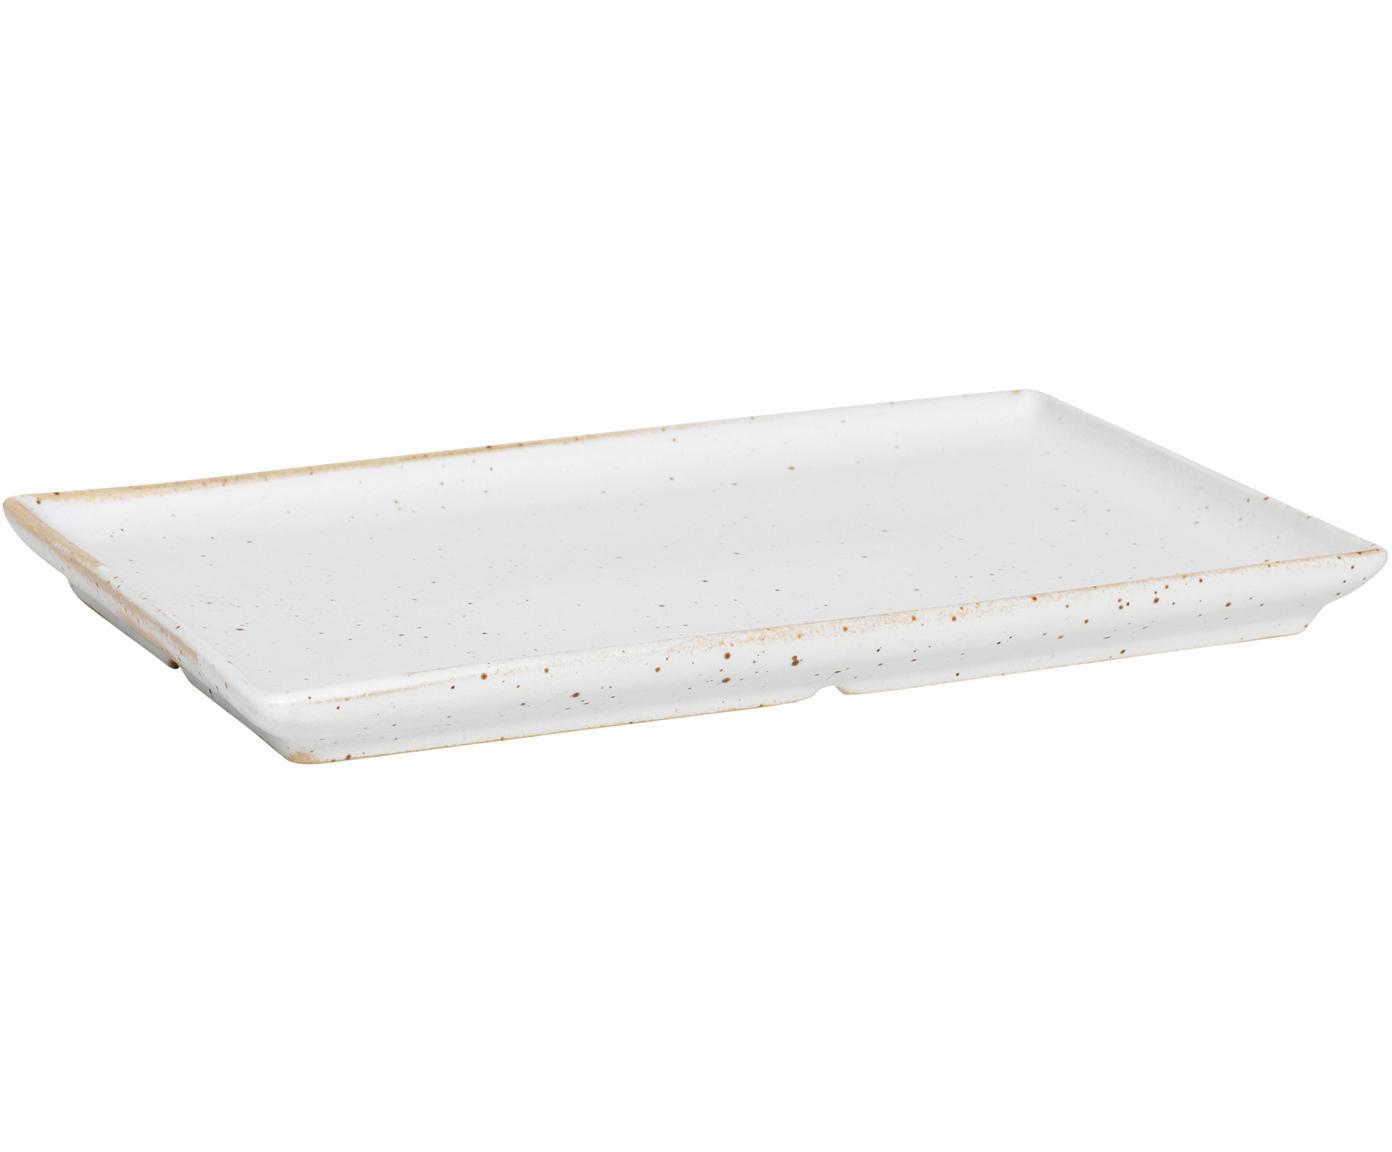 Piattino da dessert in terracotta con finitura opaca Eli 4 pz, Terracotta, Beige, grigio chiaro, Larg. 20 x Alt. 2 cm